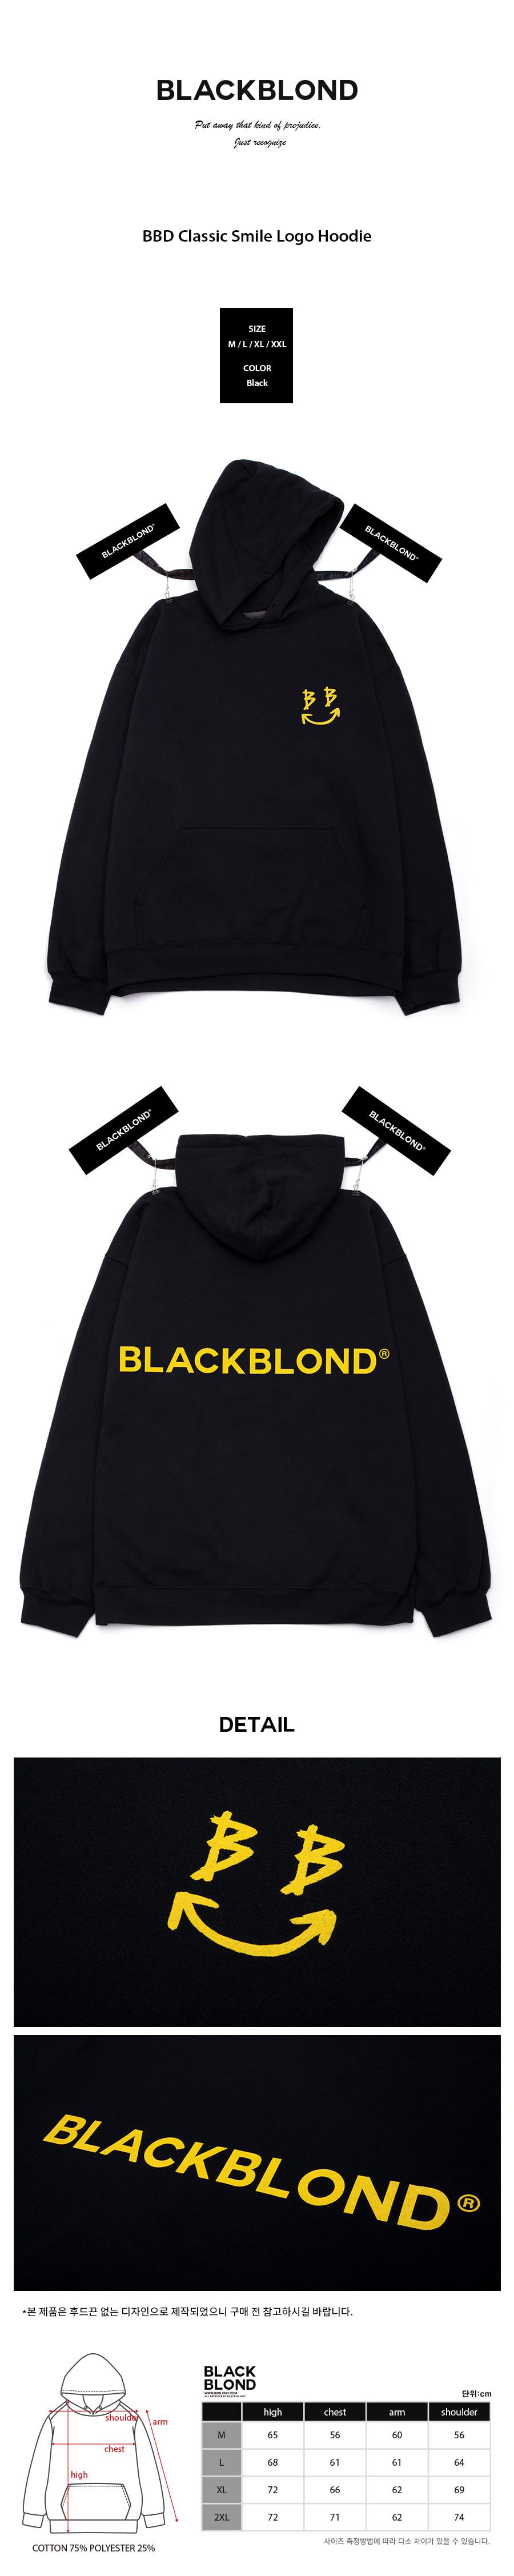 BLACKBLOND - BBD Classic Smile Logo Hoodie (Black)